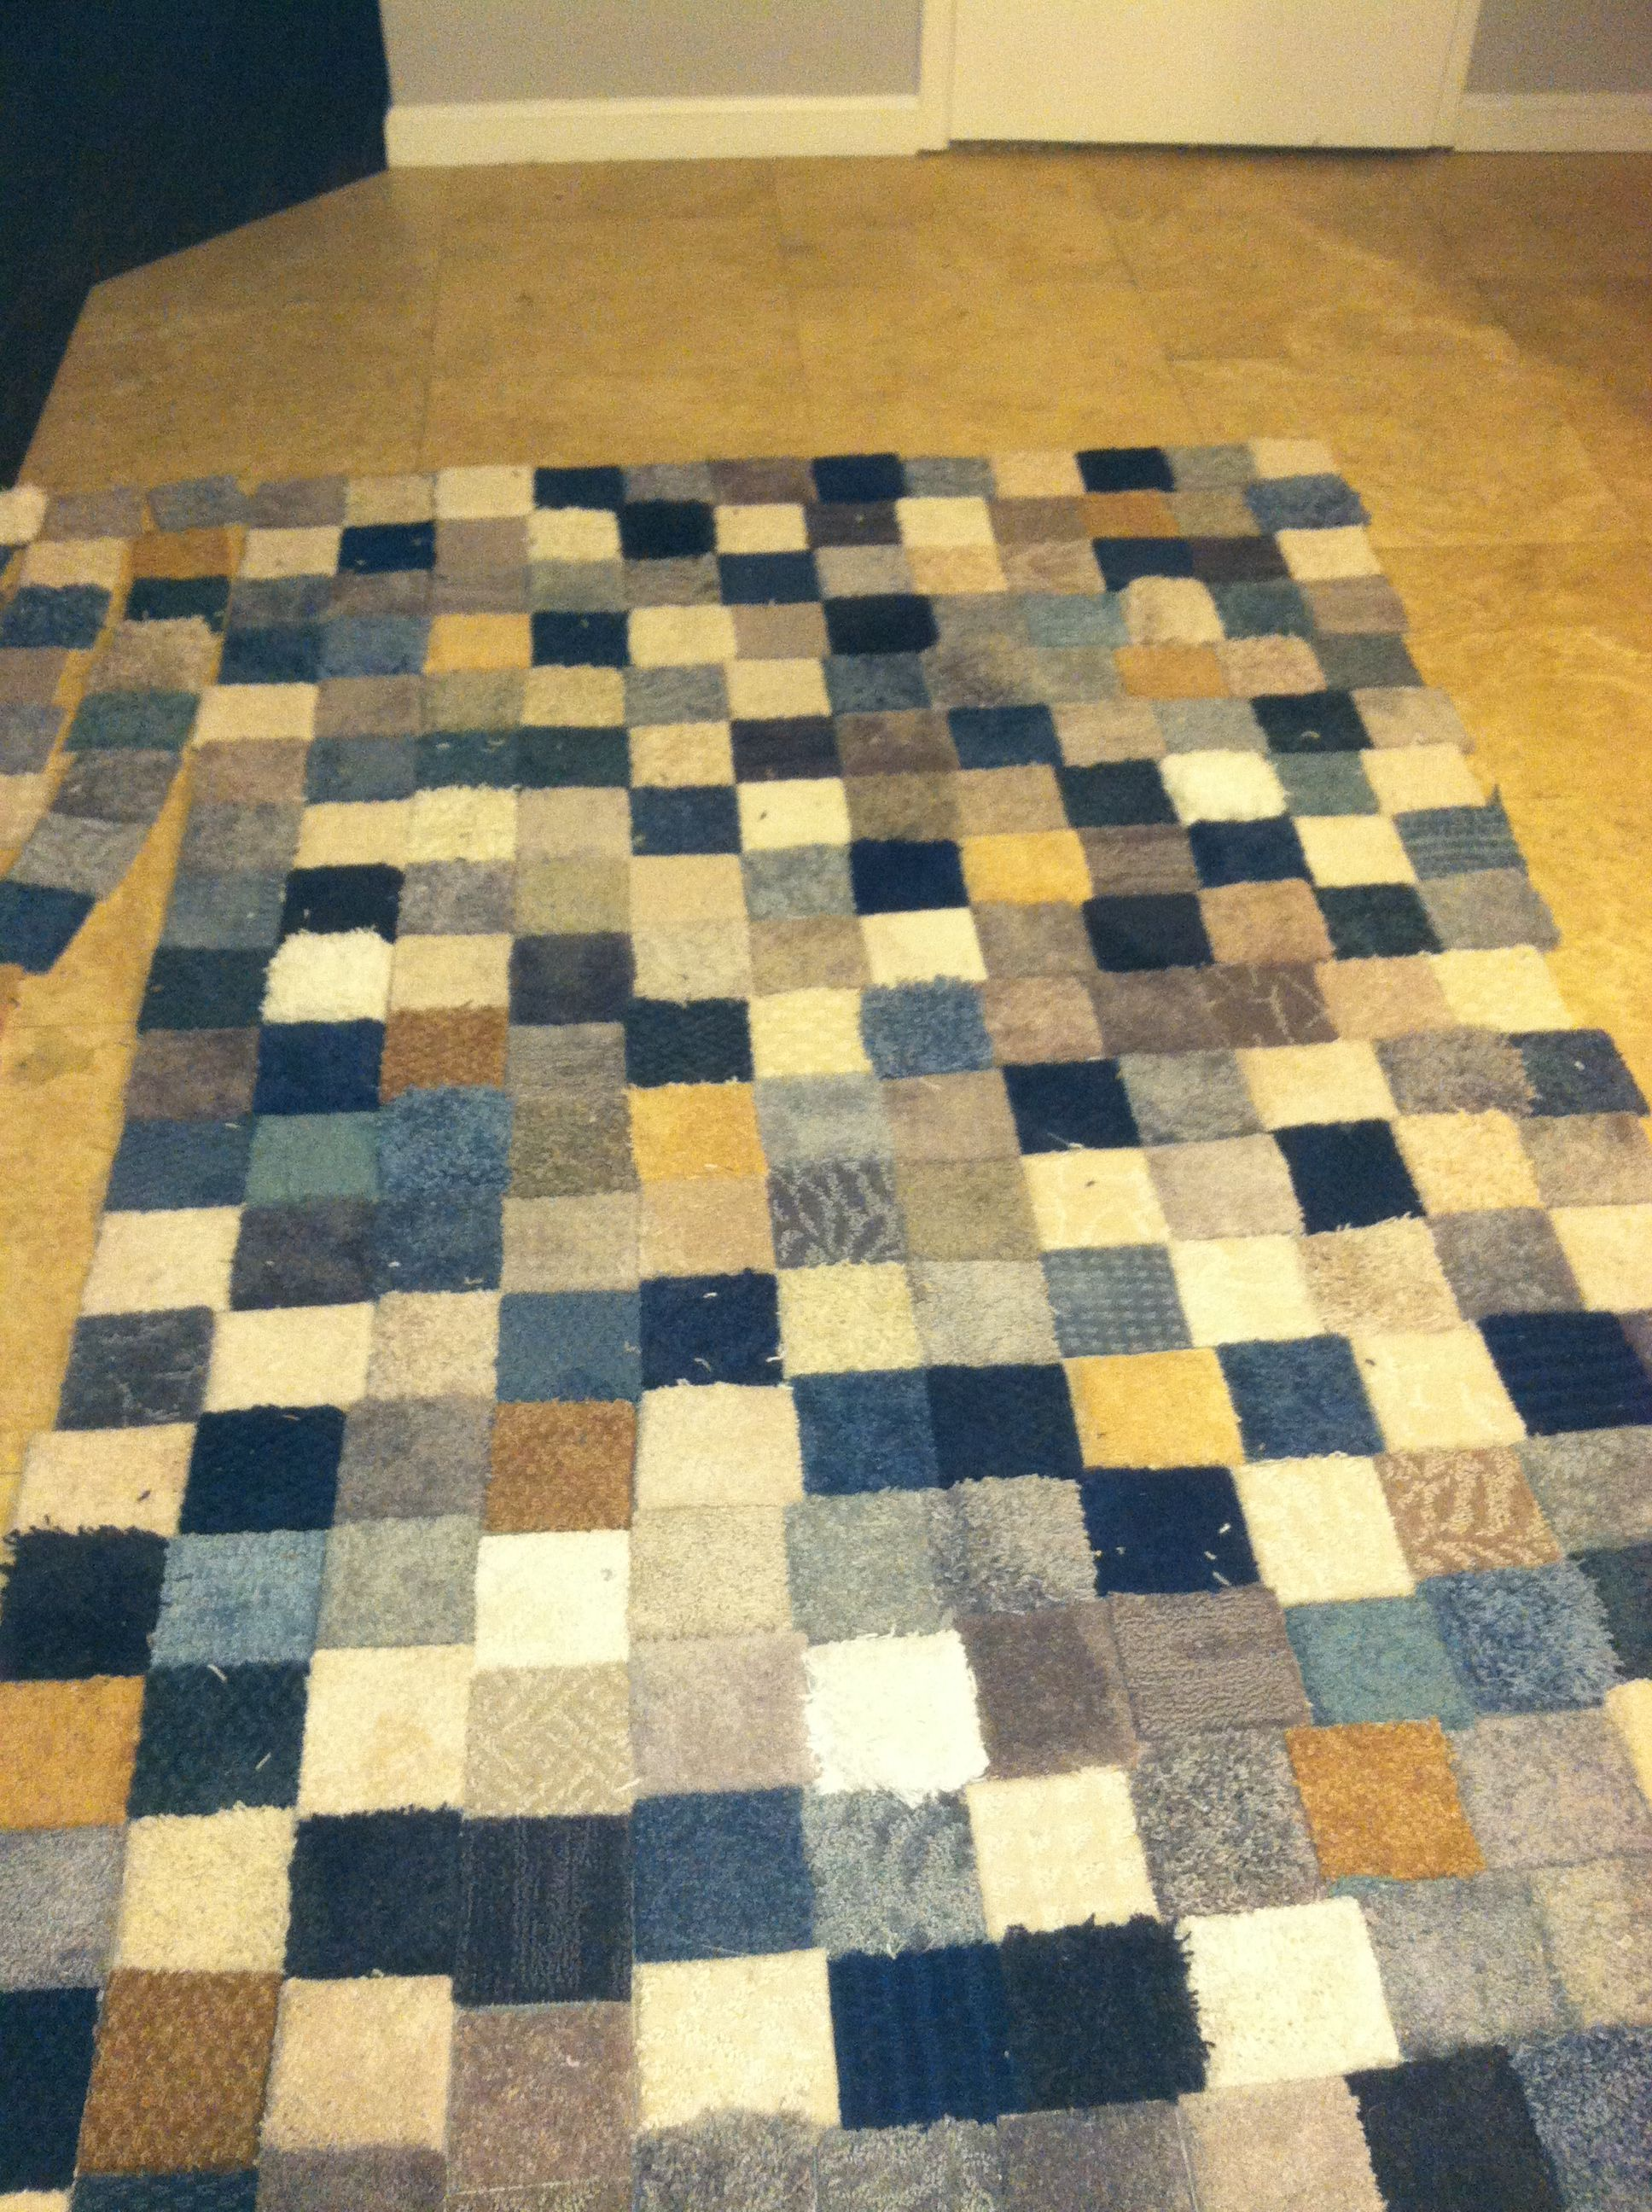 Patchwork Rug Made From Free Carpet Samples And Gorilla Tape Diy Rug Diy Carpet Carpet Square Rugs